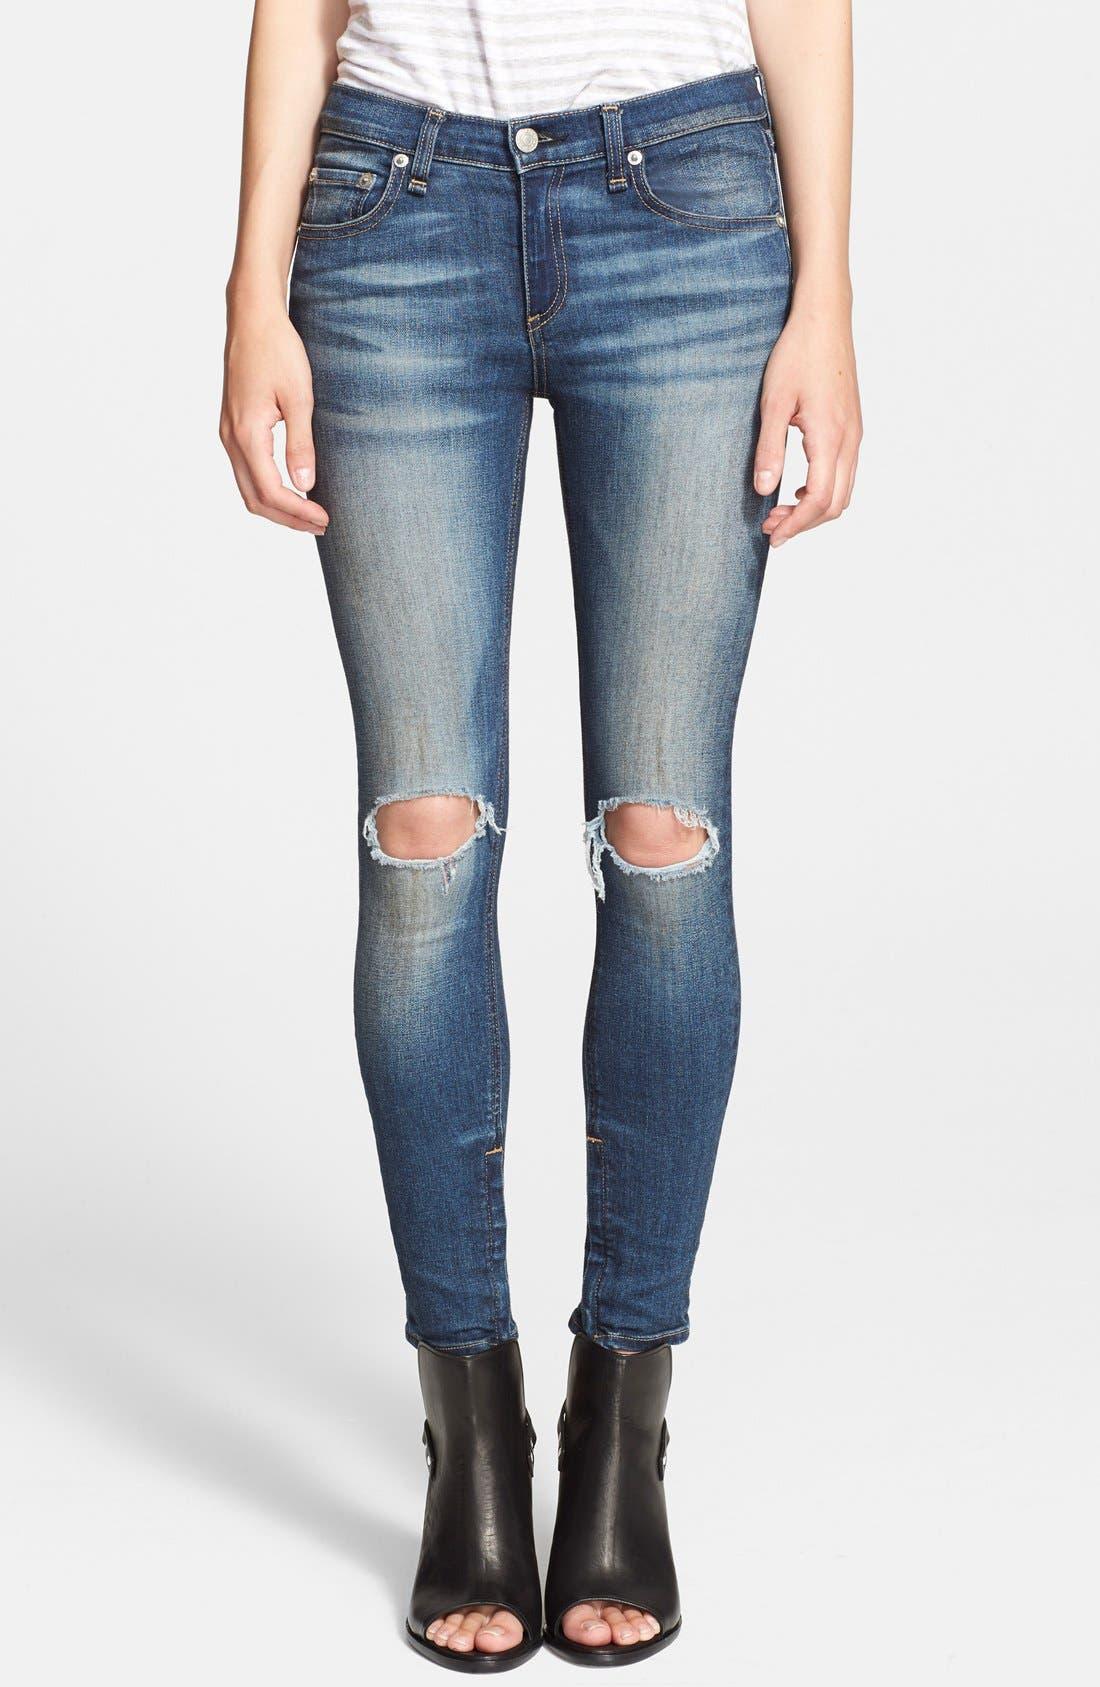 Alternate Image 1 Selected - rag & bone/JEAN Destroyed Skinny Ankle Jeans (Pacifico)